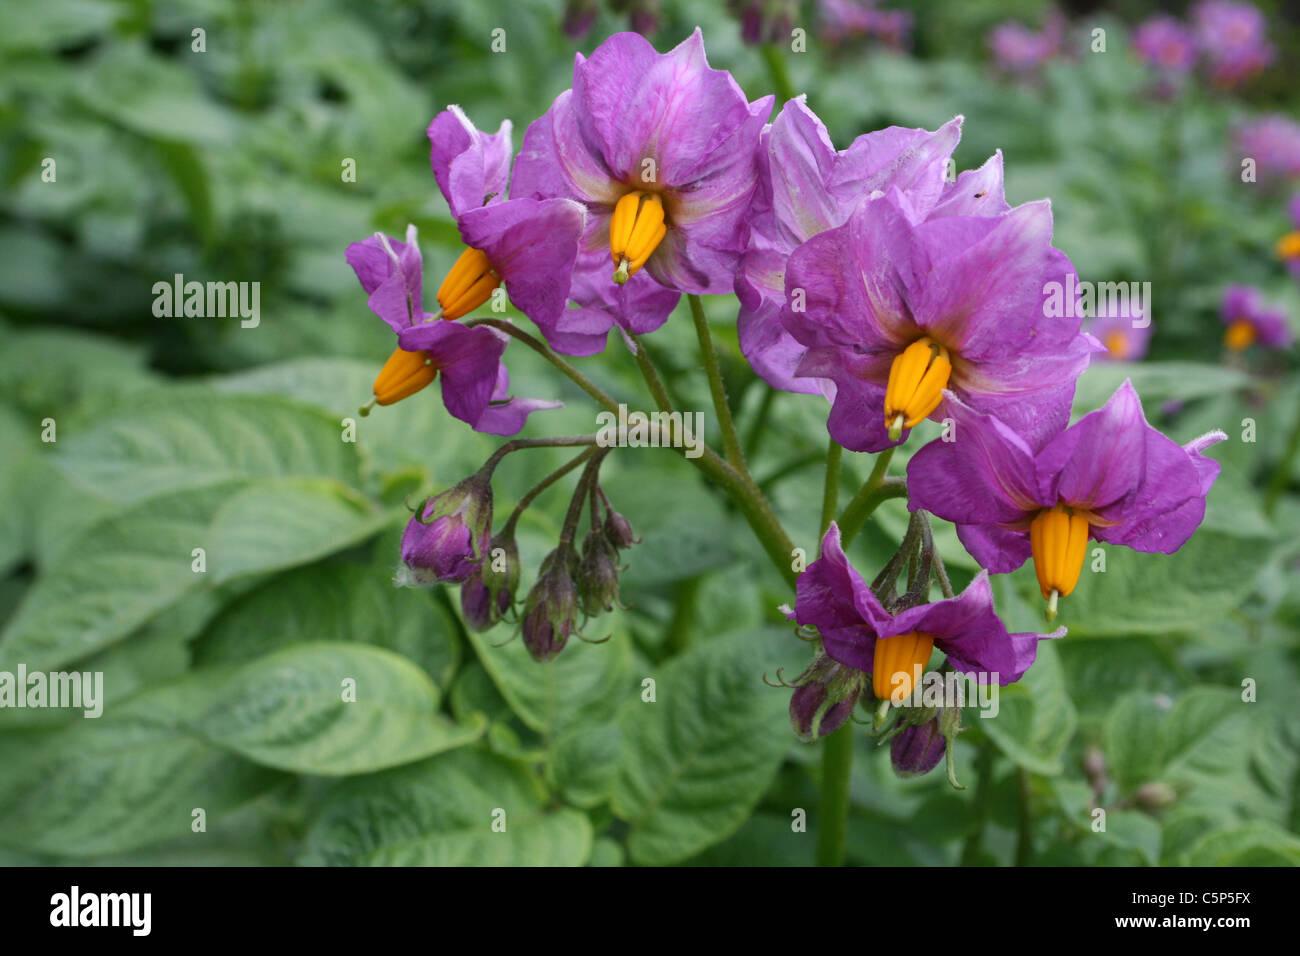 Potato Flowers Solanum tuberosum - Stock Image